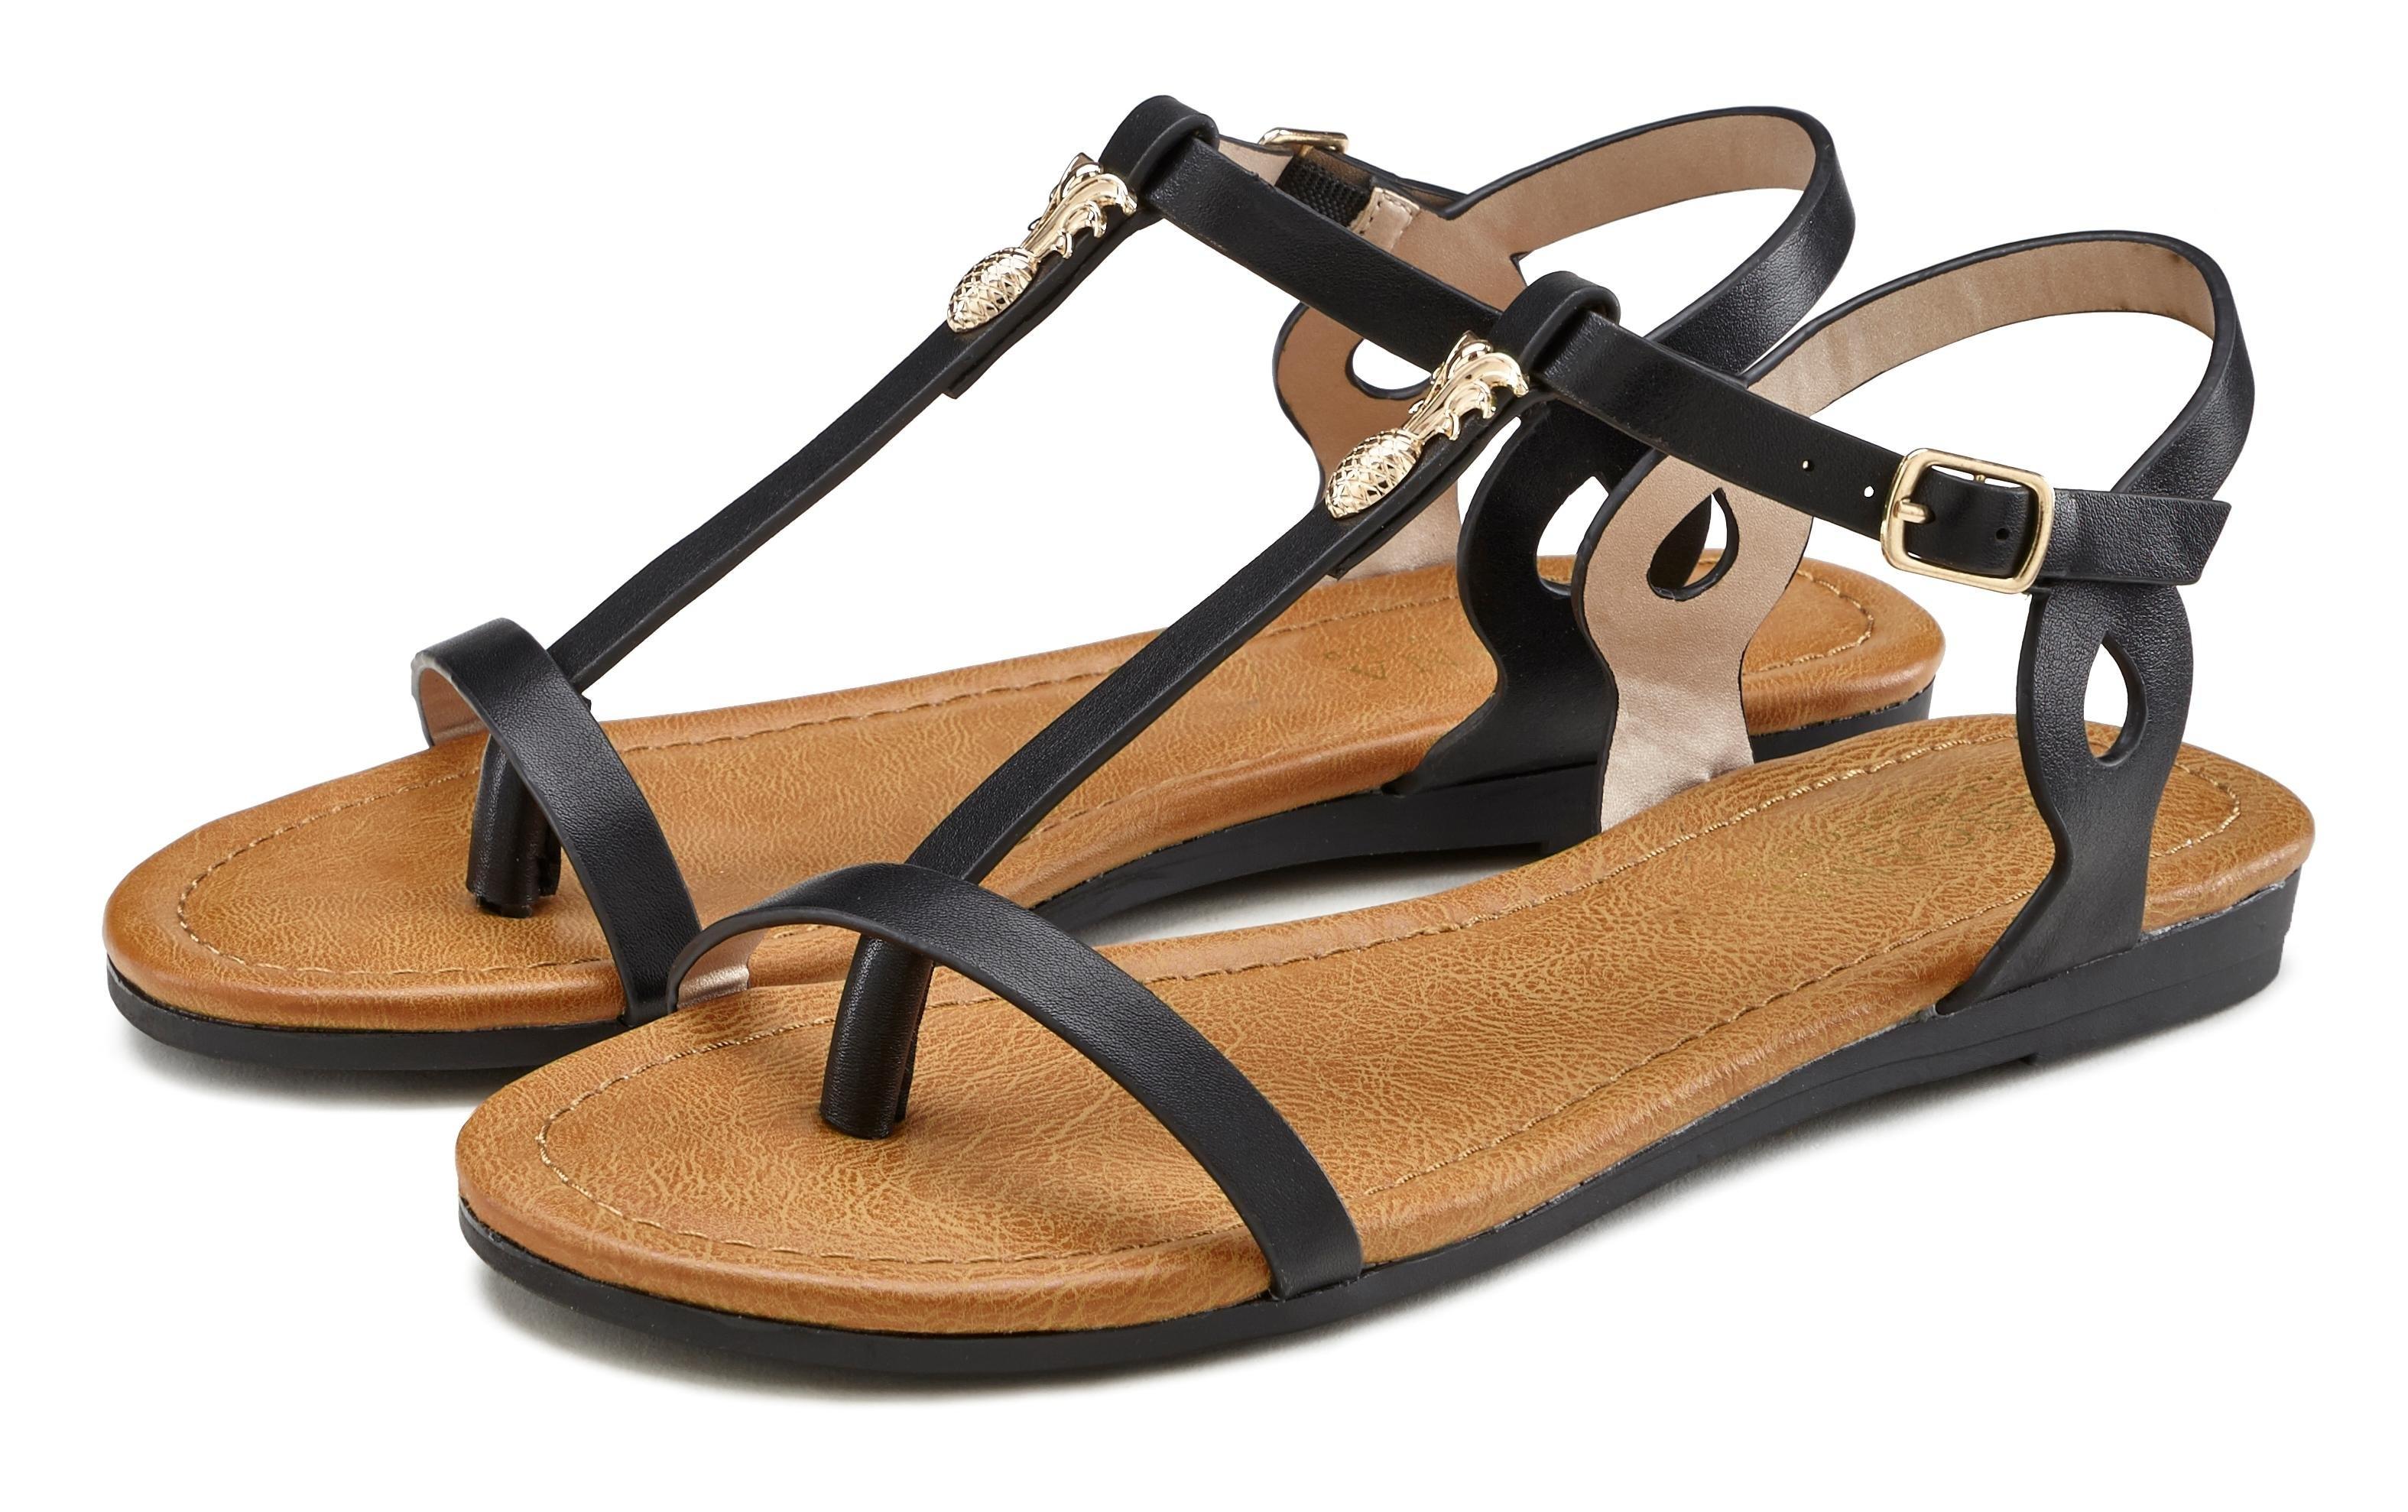 LASCANA sandalen - gratis ruilen op lascana.nl